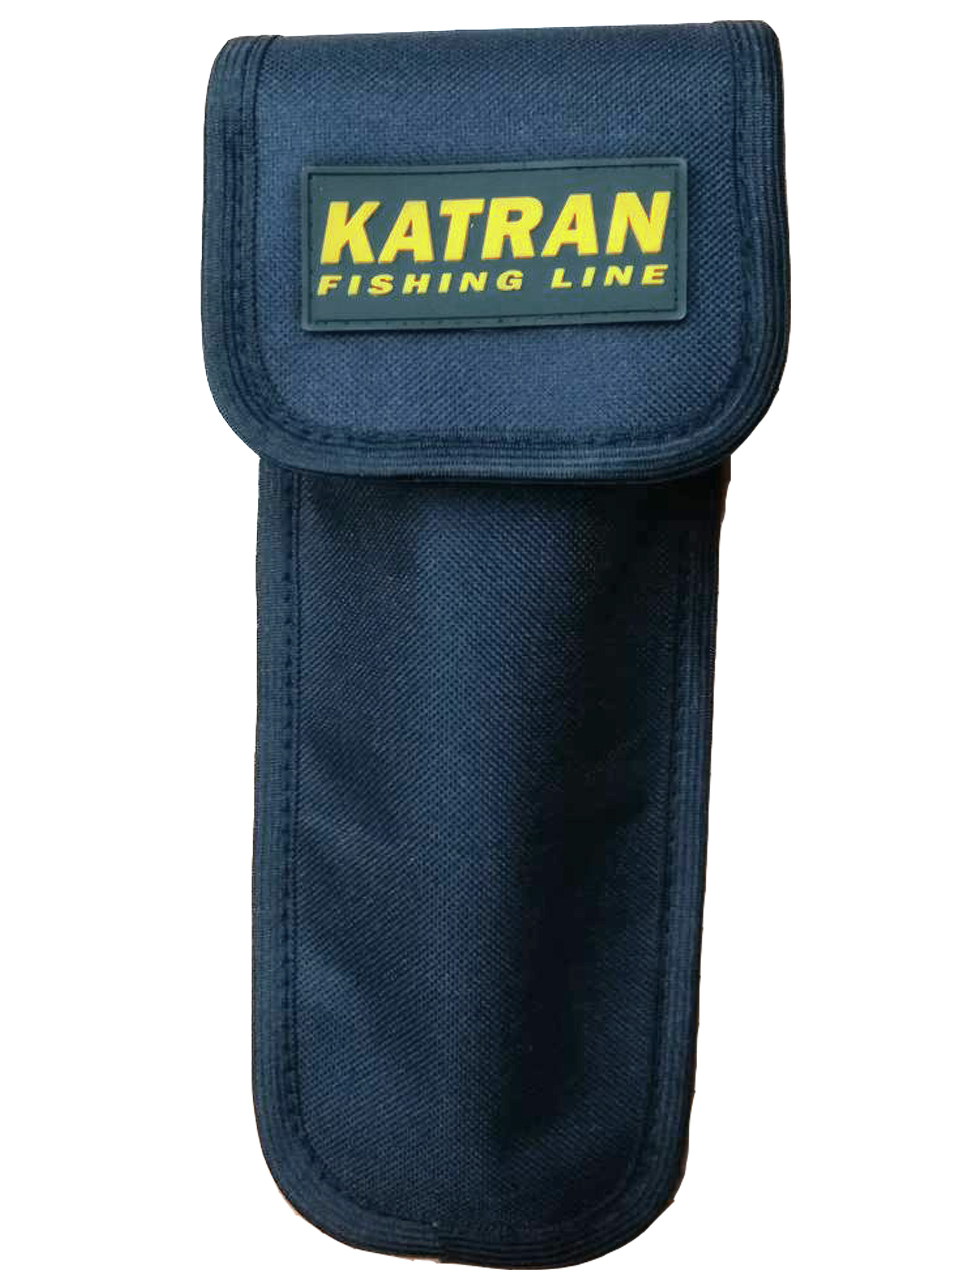 KATRAN Line Spooling tool Aufspulhilfe Schnurspulgerät